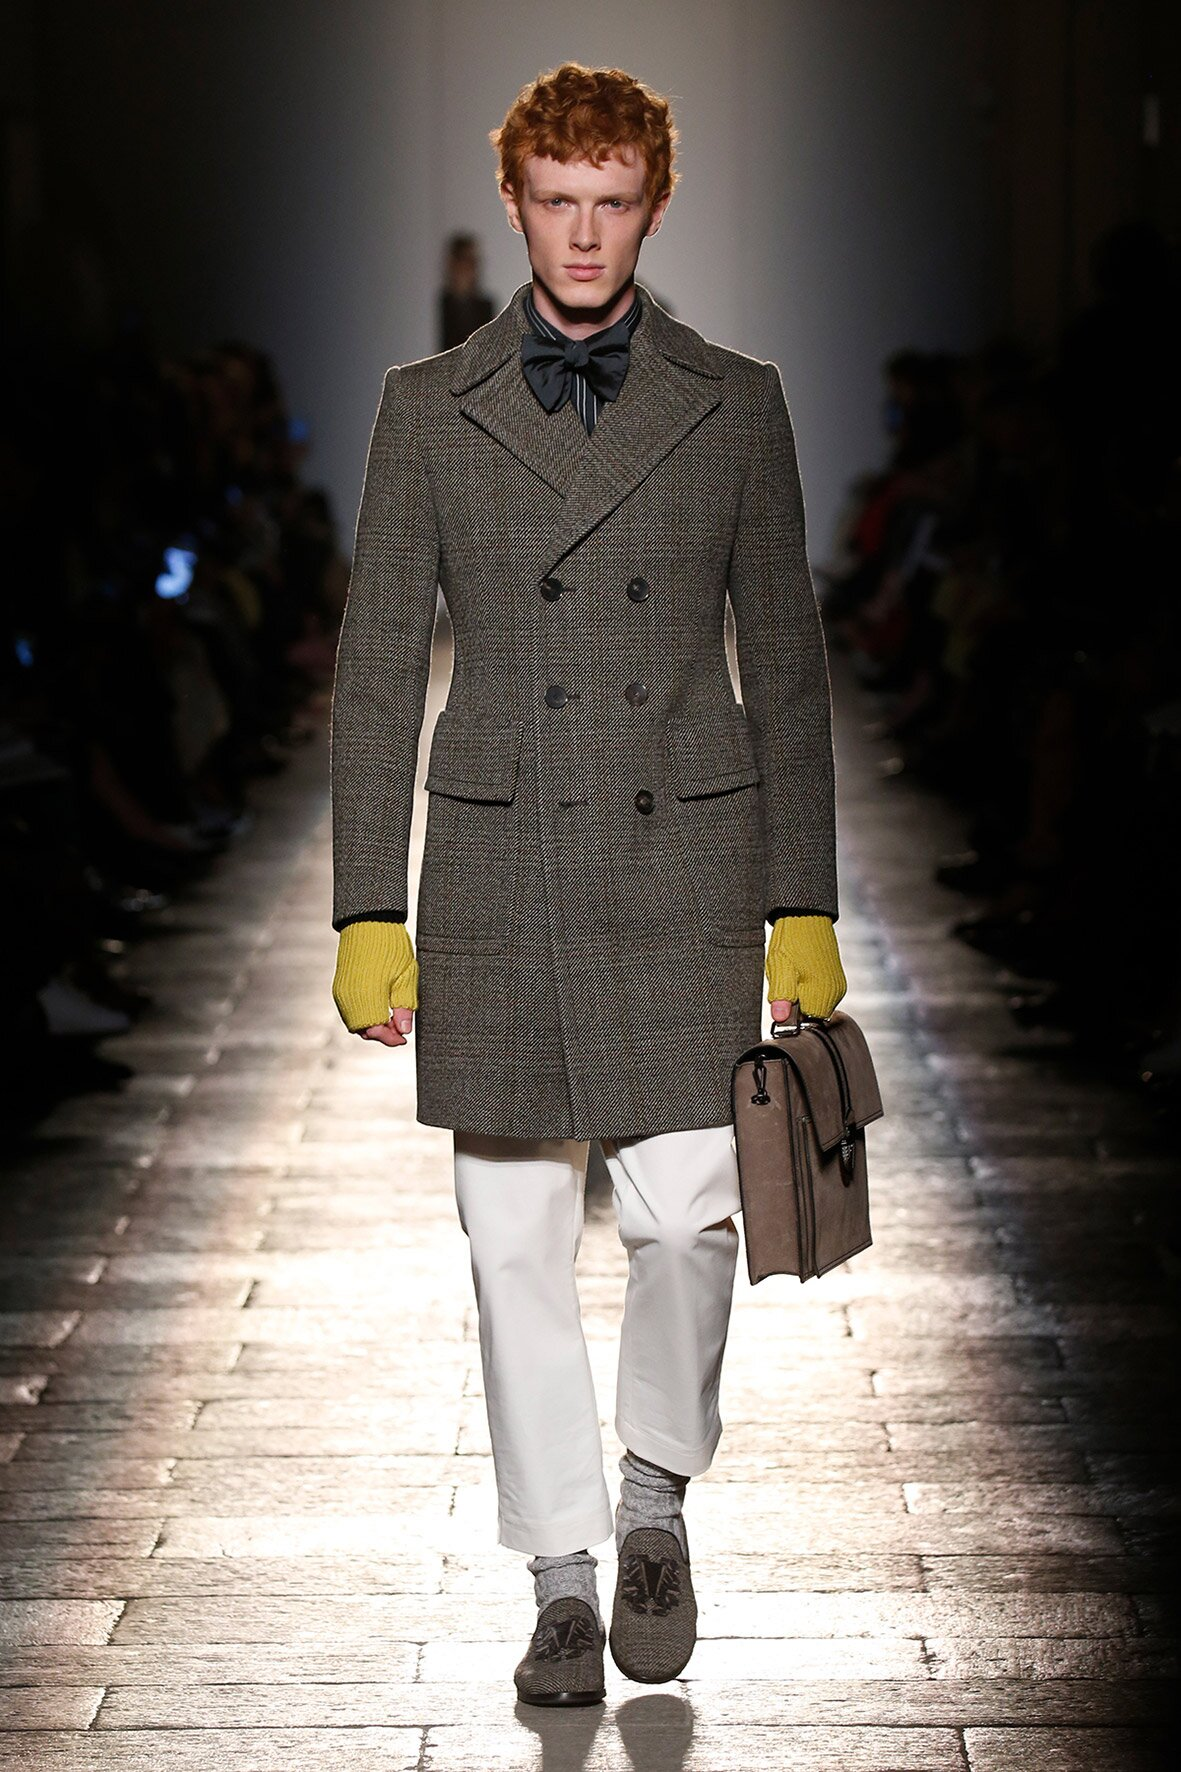 Fashion Man Model Bottega Veneta Catwalk 17-18